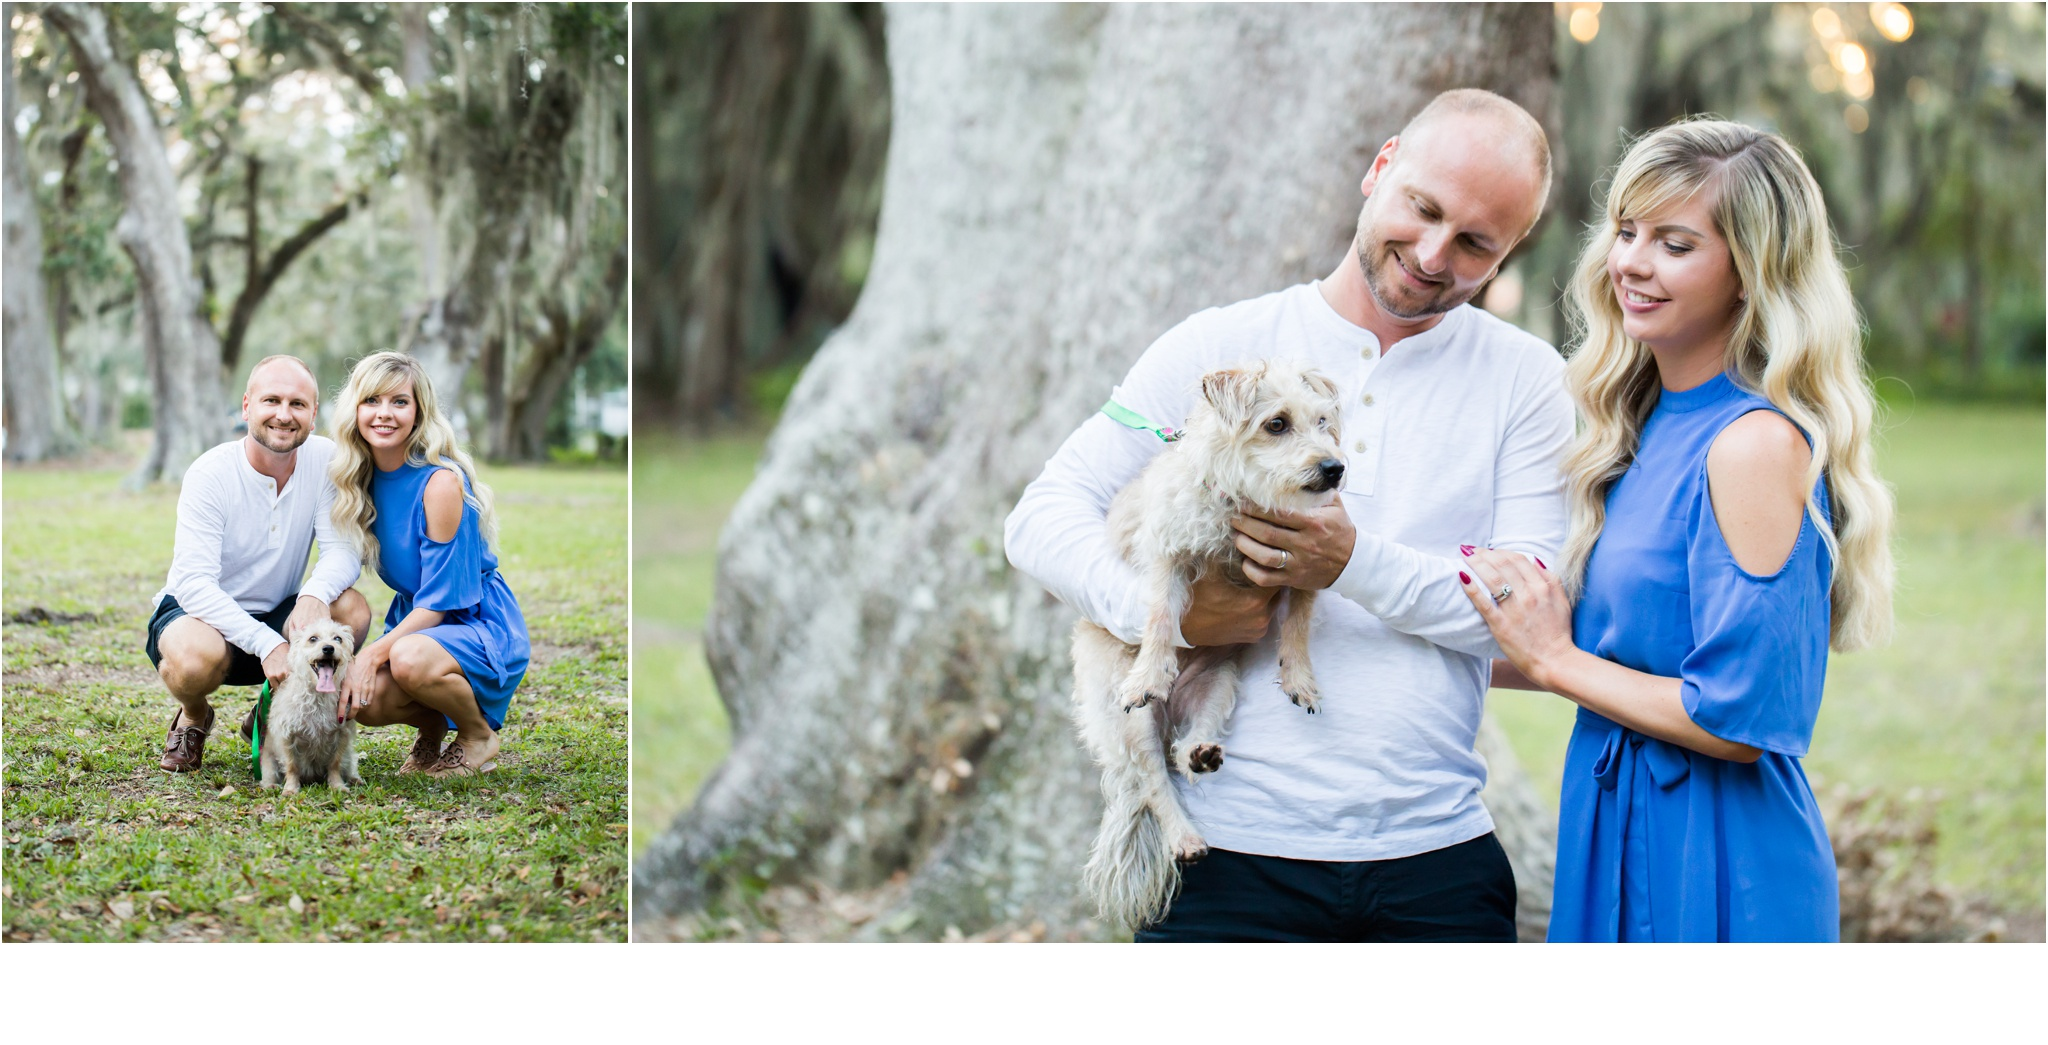 Rainey_Gregg_Photography_St._Simons_Island_Georgia_California_Wedding_Portrait_Photography_0259.jpg